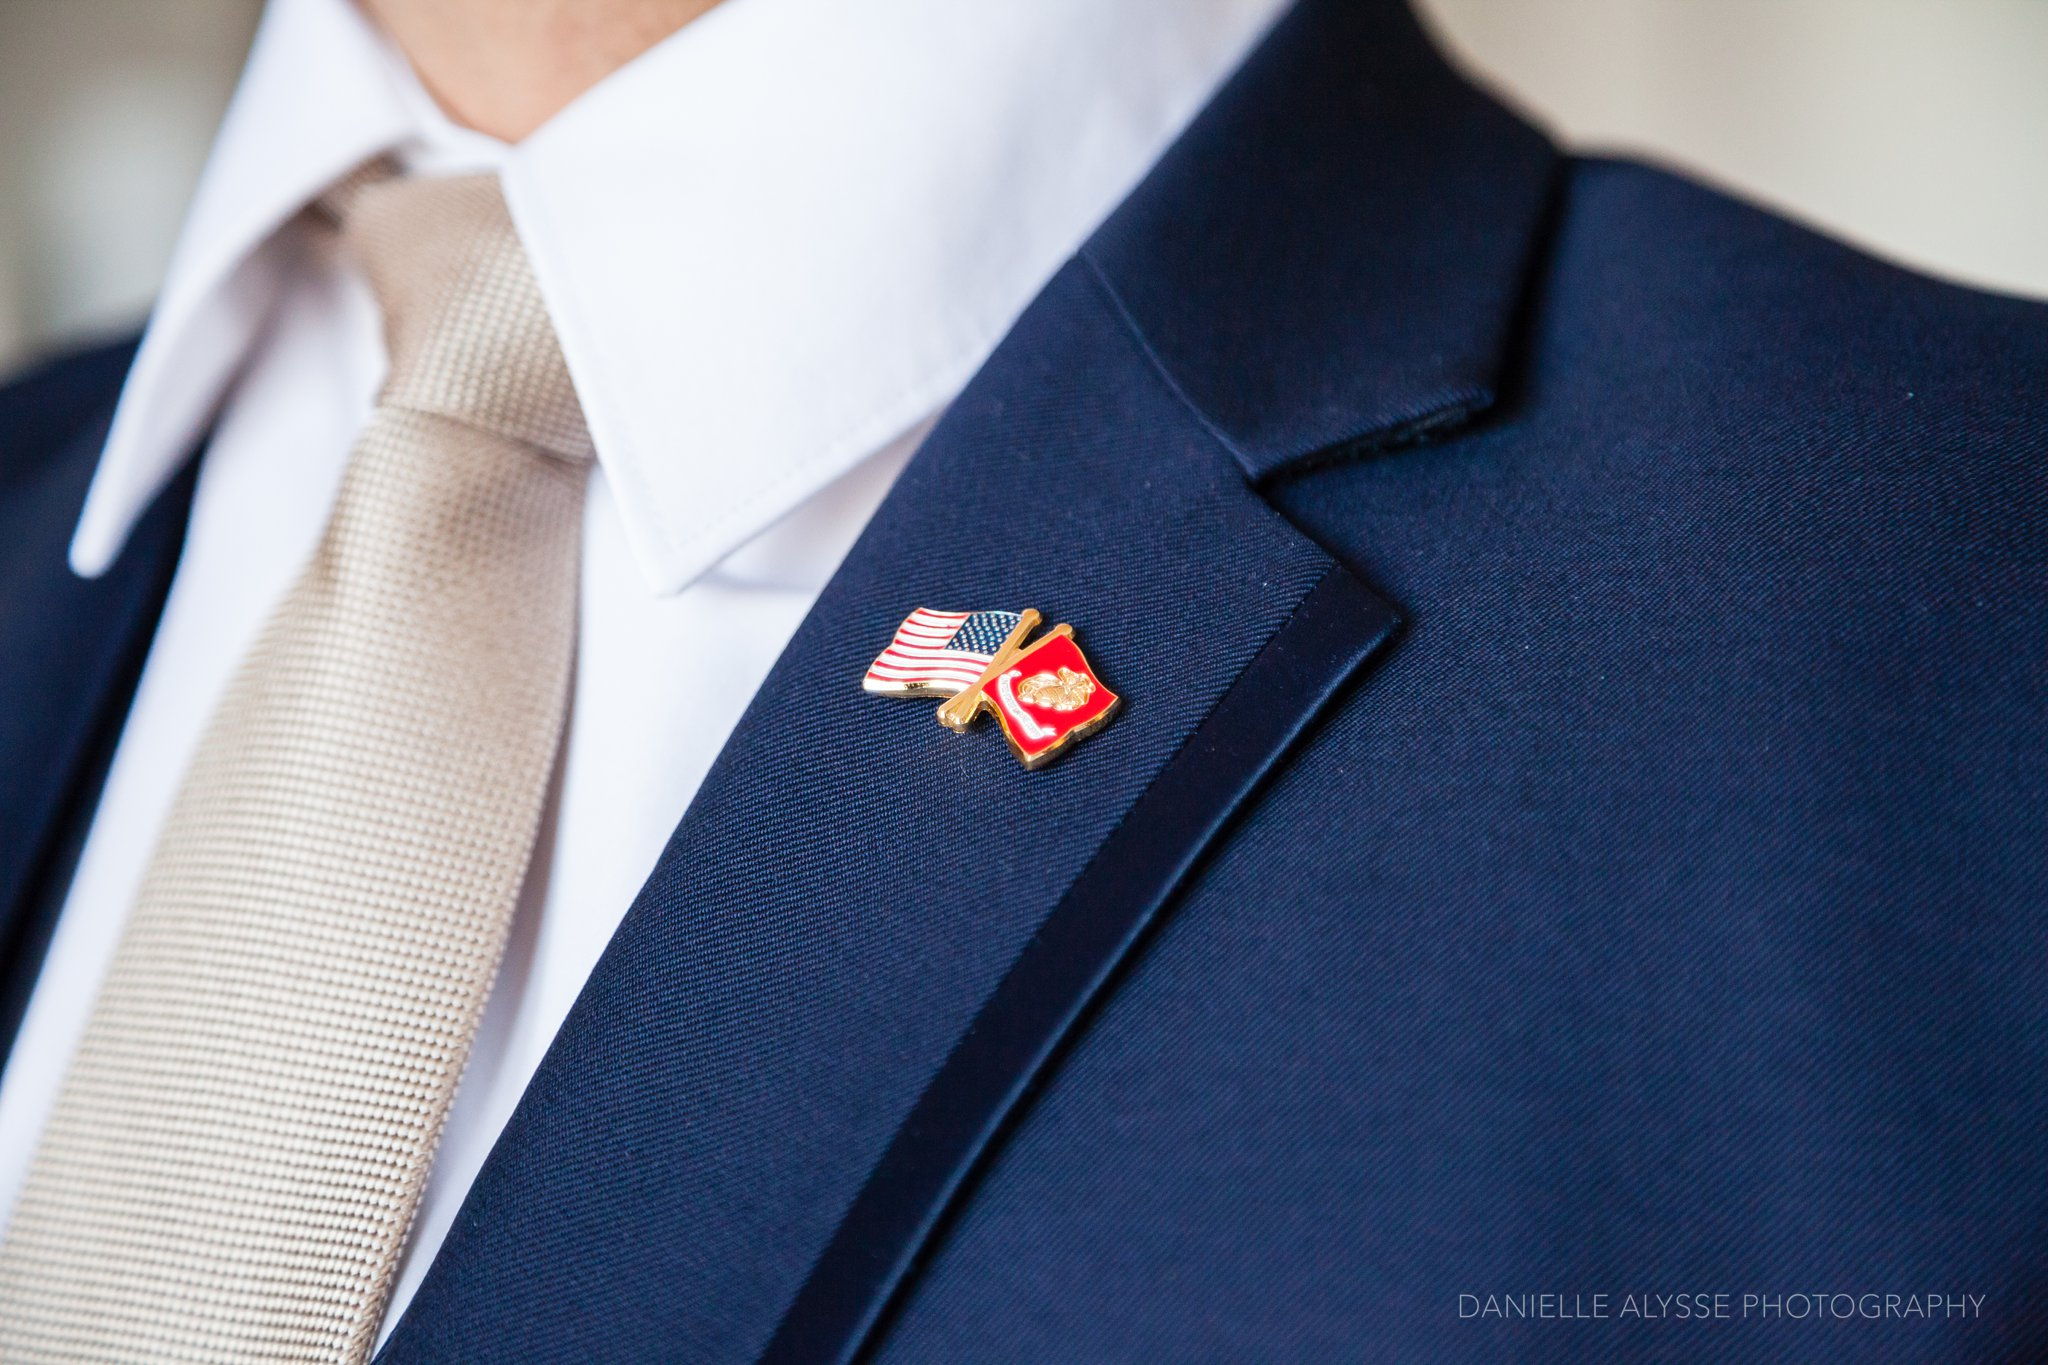 170429_blog_kimberly_ben_wedding_san_mateo_curiodyssey_danielle_alysse_photography_sacramento_photographer0091_WEB.jpg